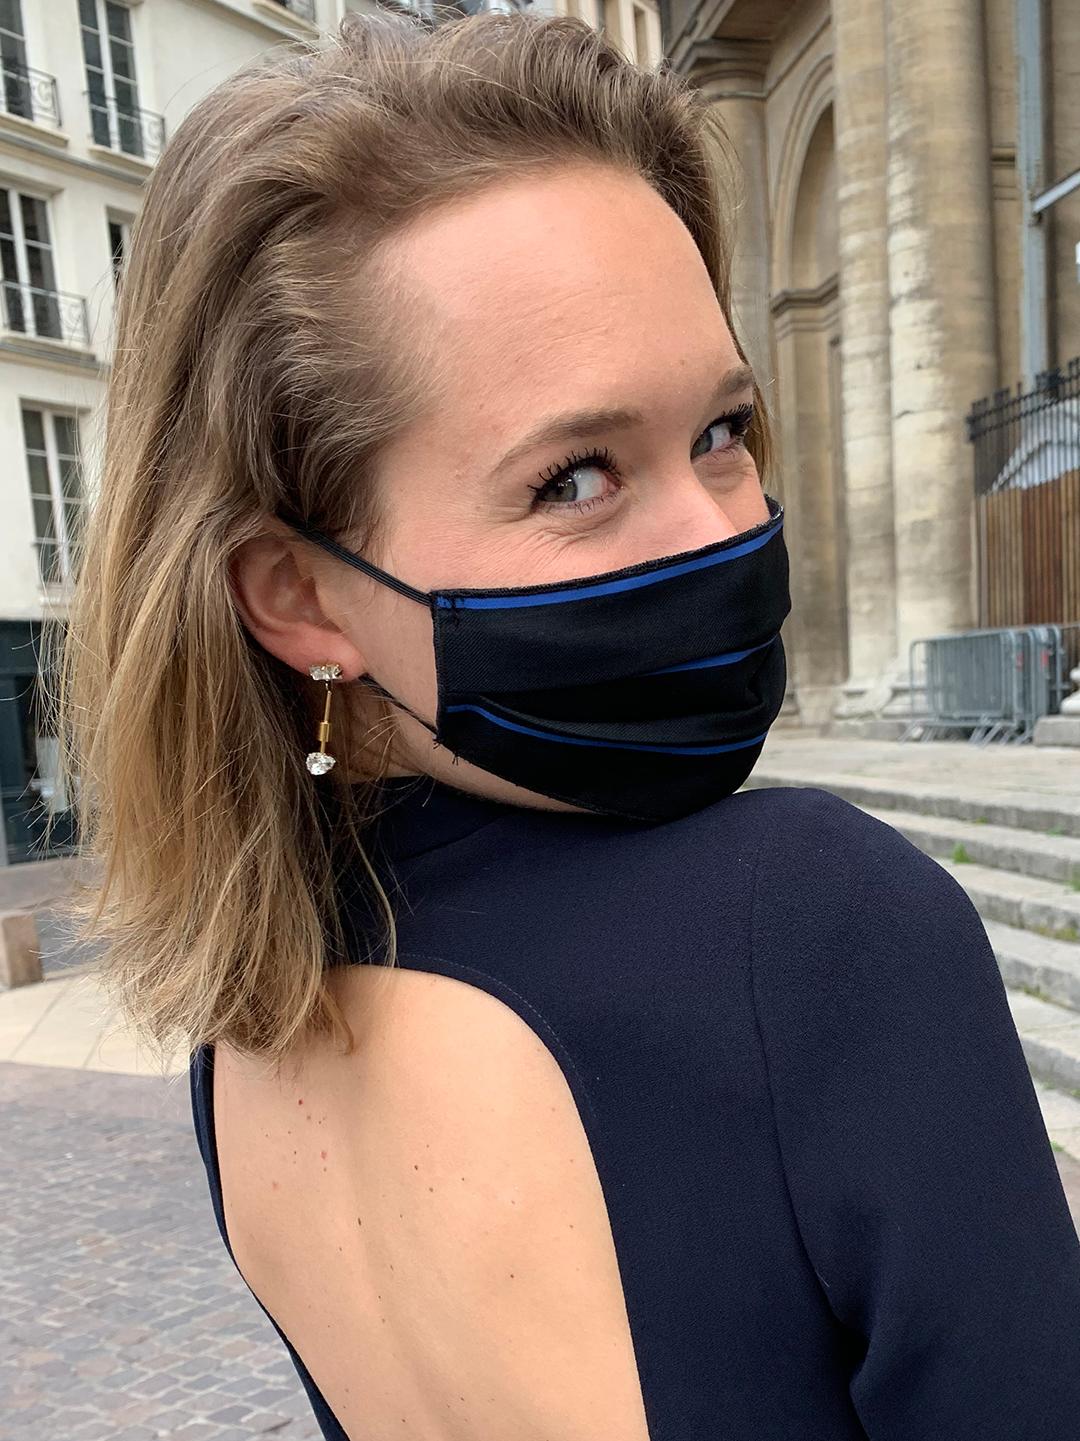 Masque de Protection Noir Rayé Bleu femme